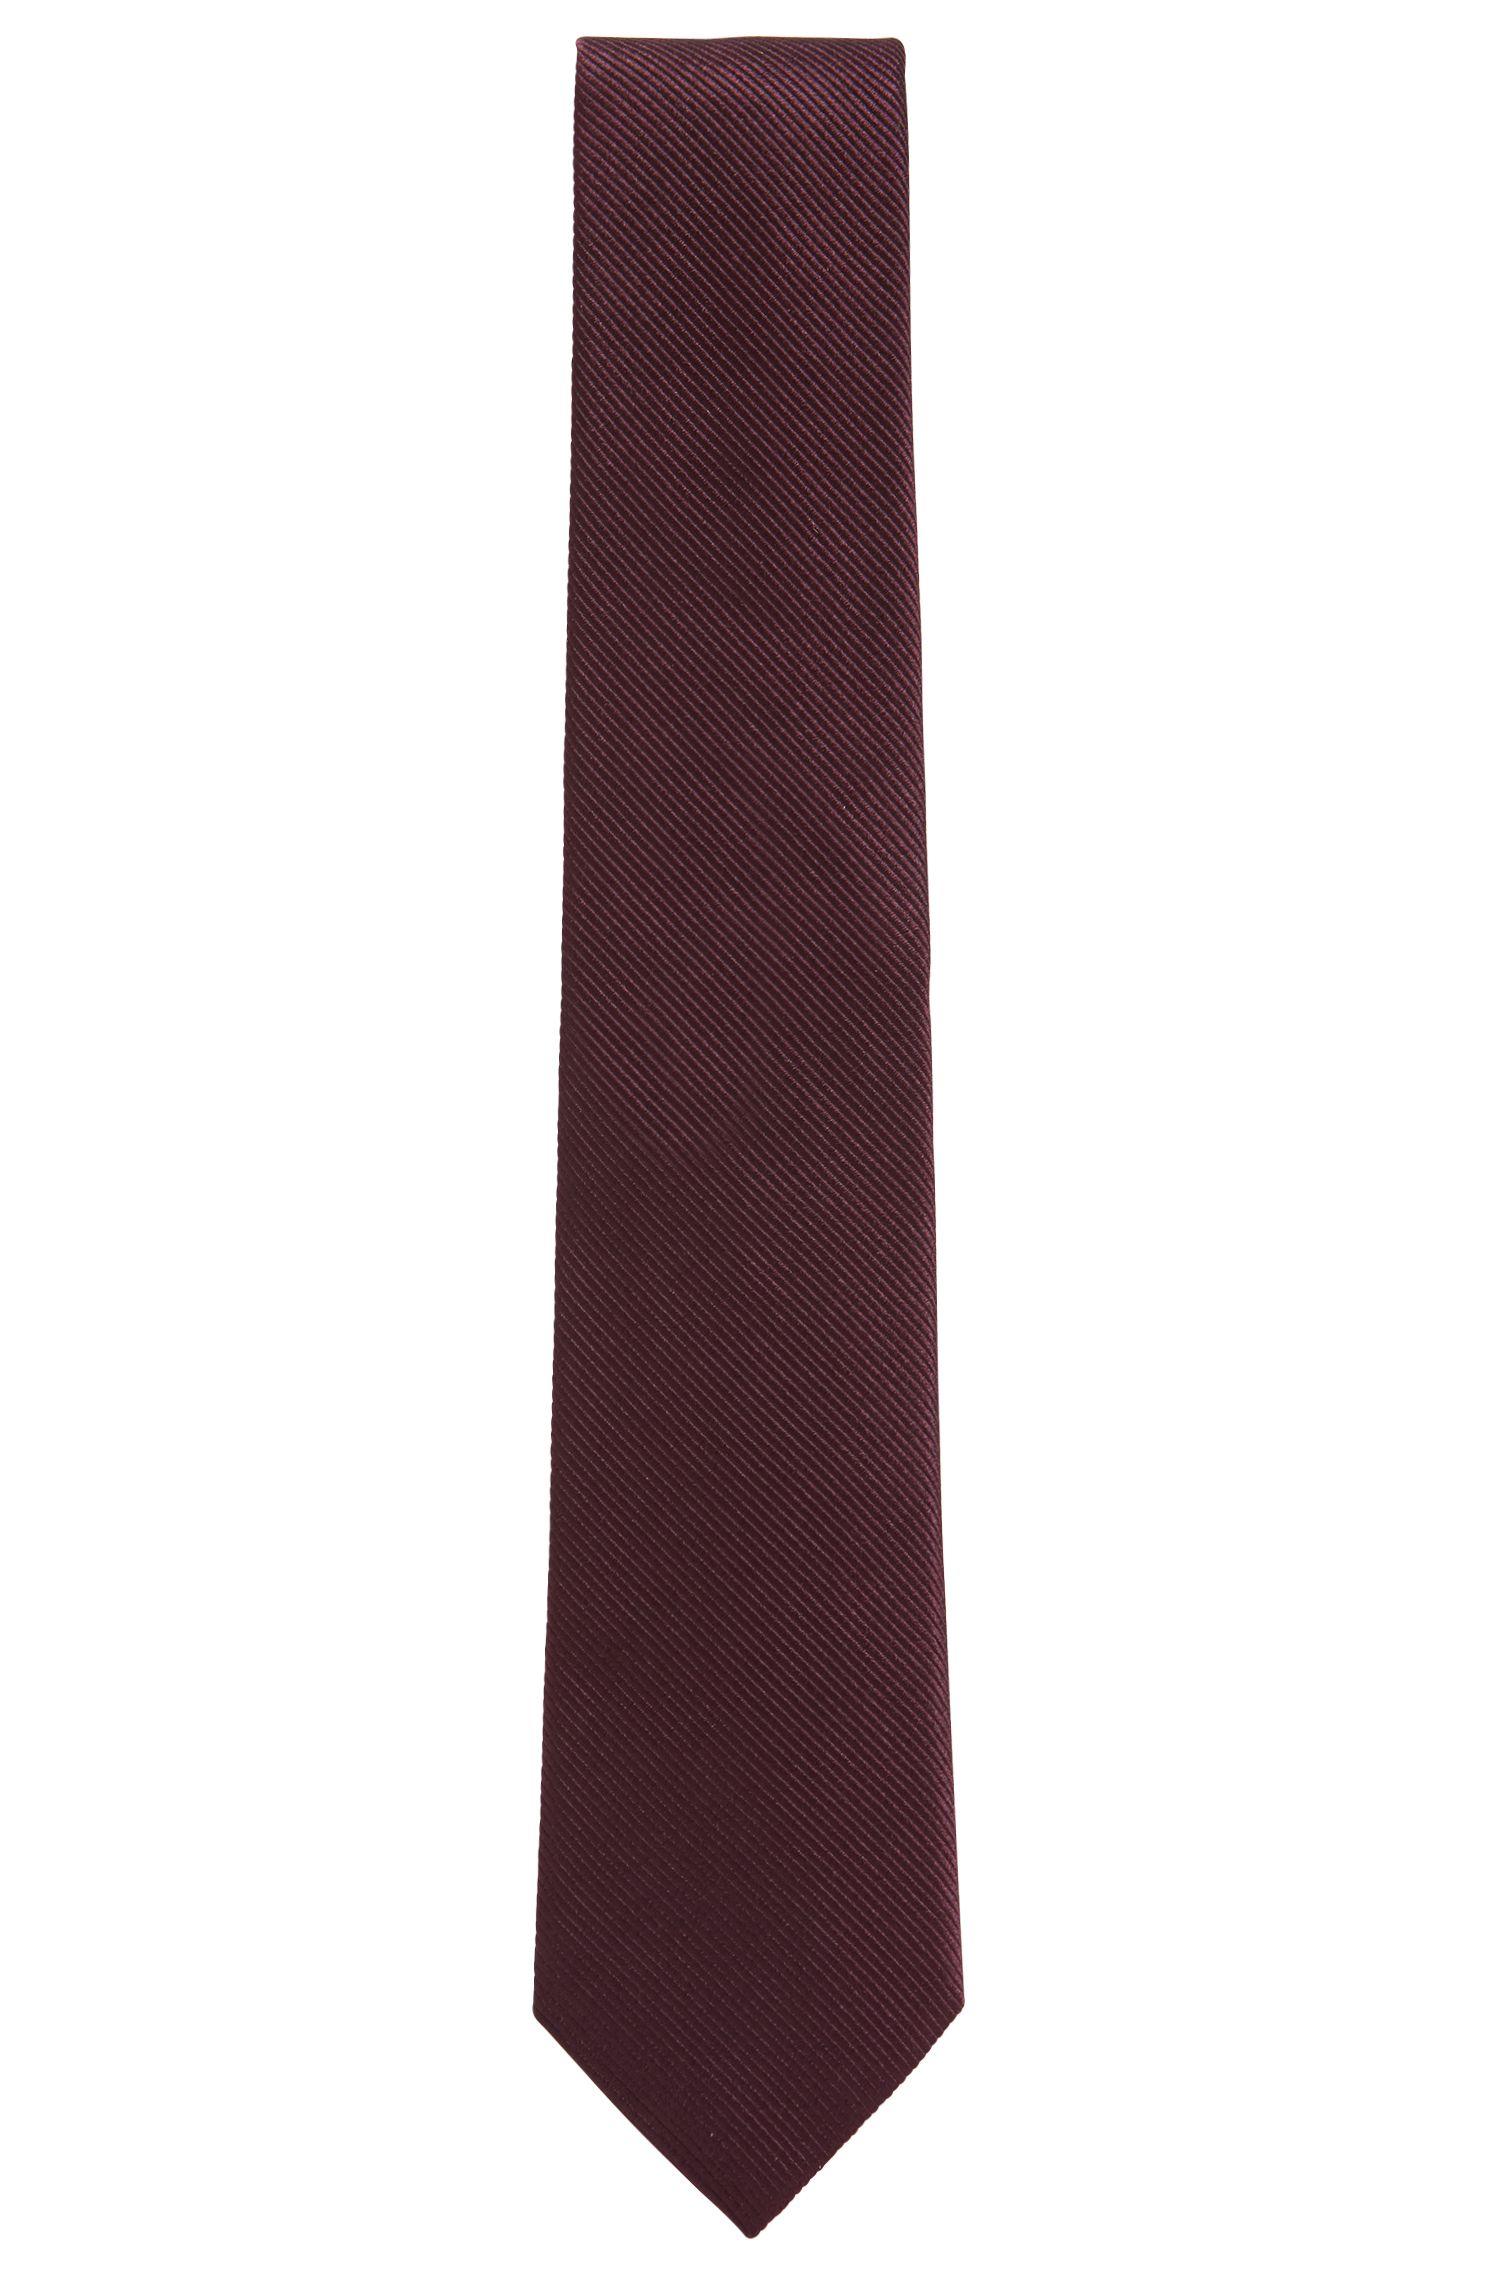 Corbata de seda con rayas tejidas en diagonal, Púrpura oscuro